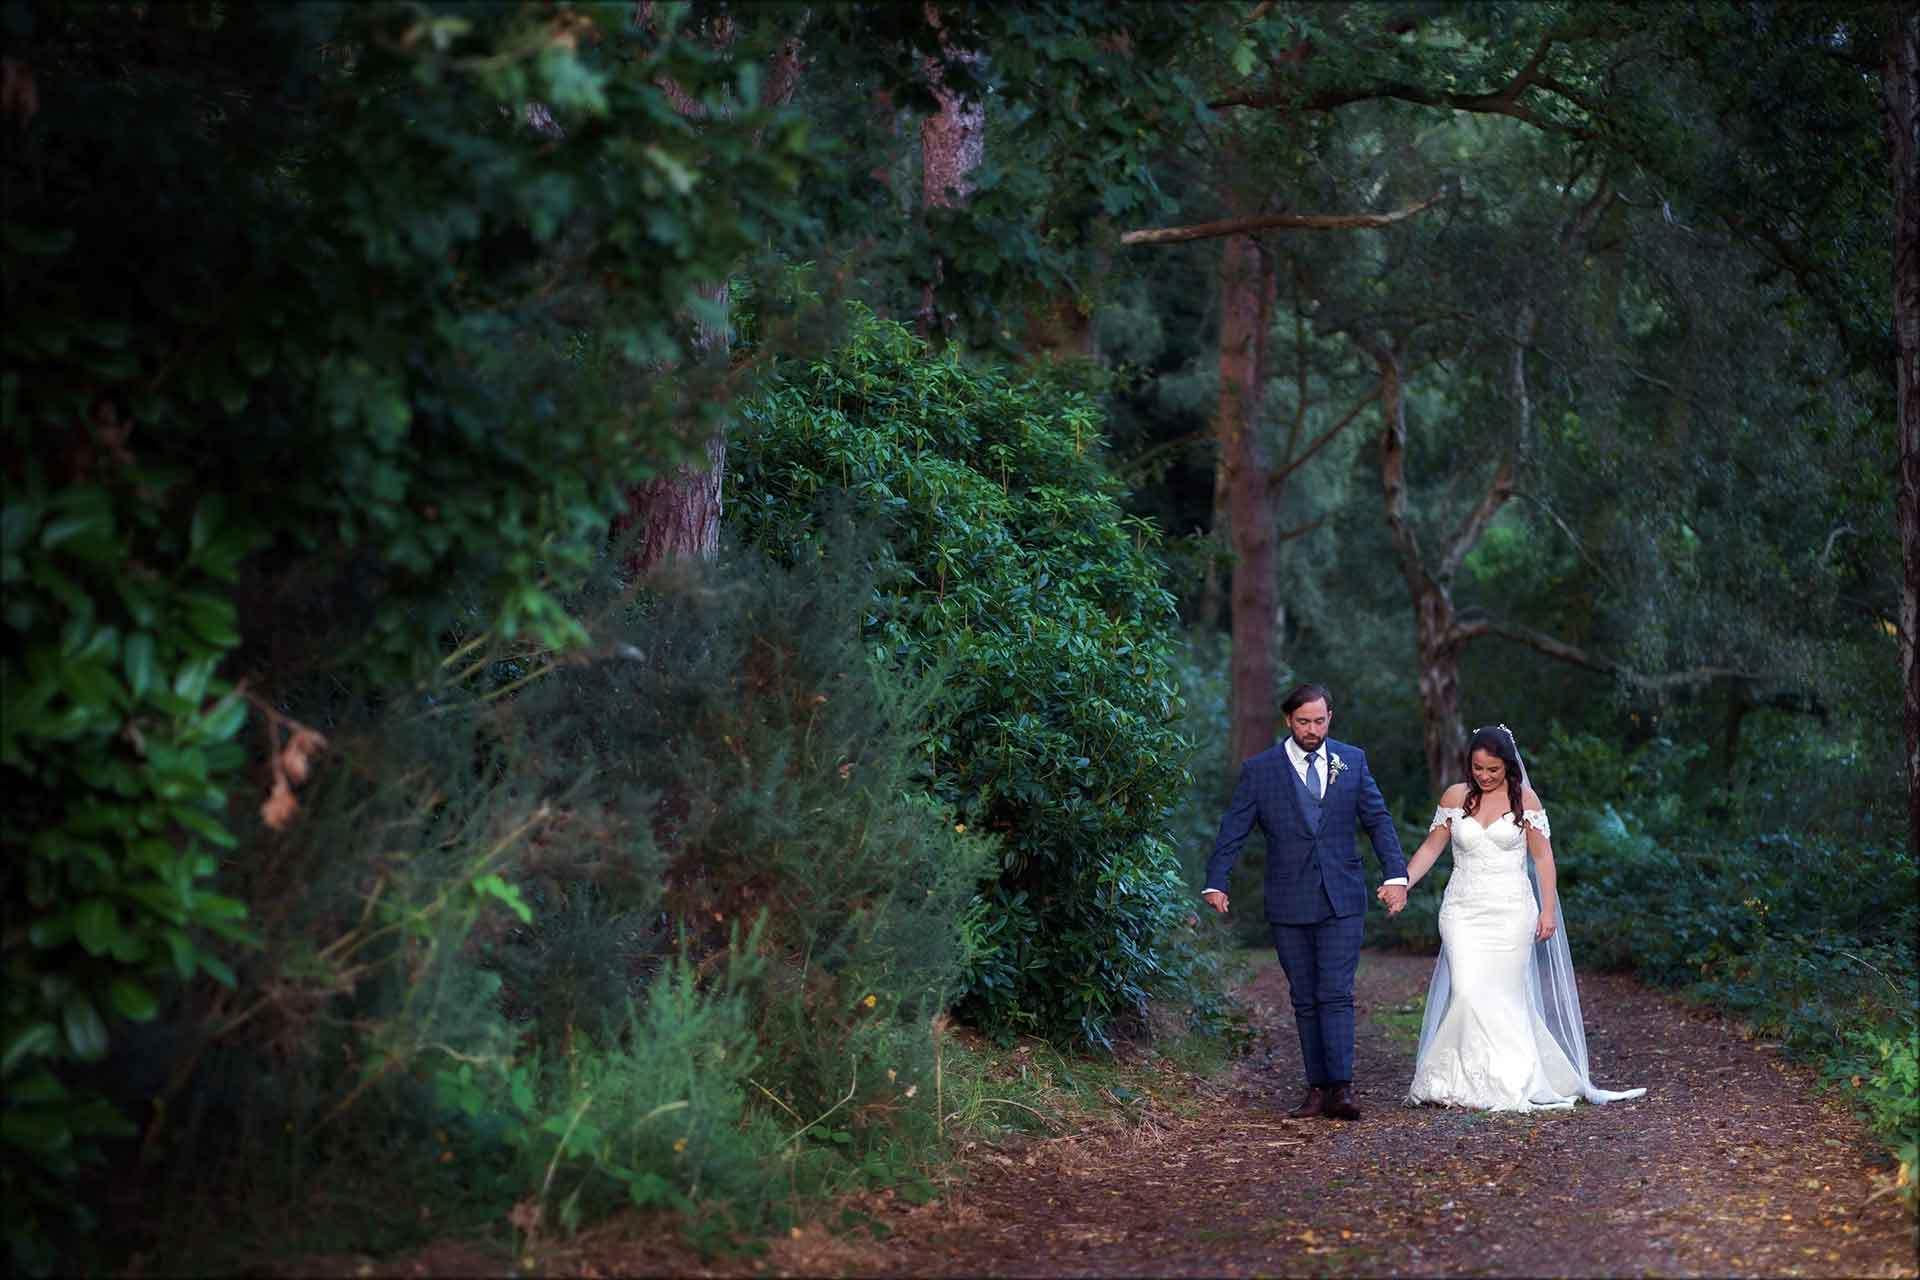 Bride and groom walking through woodlands